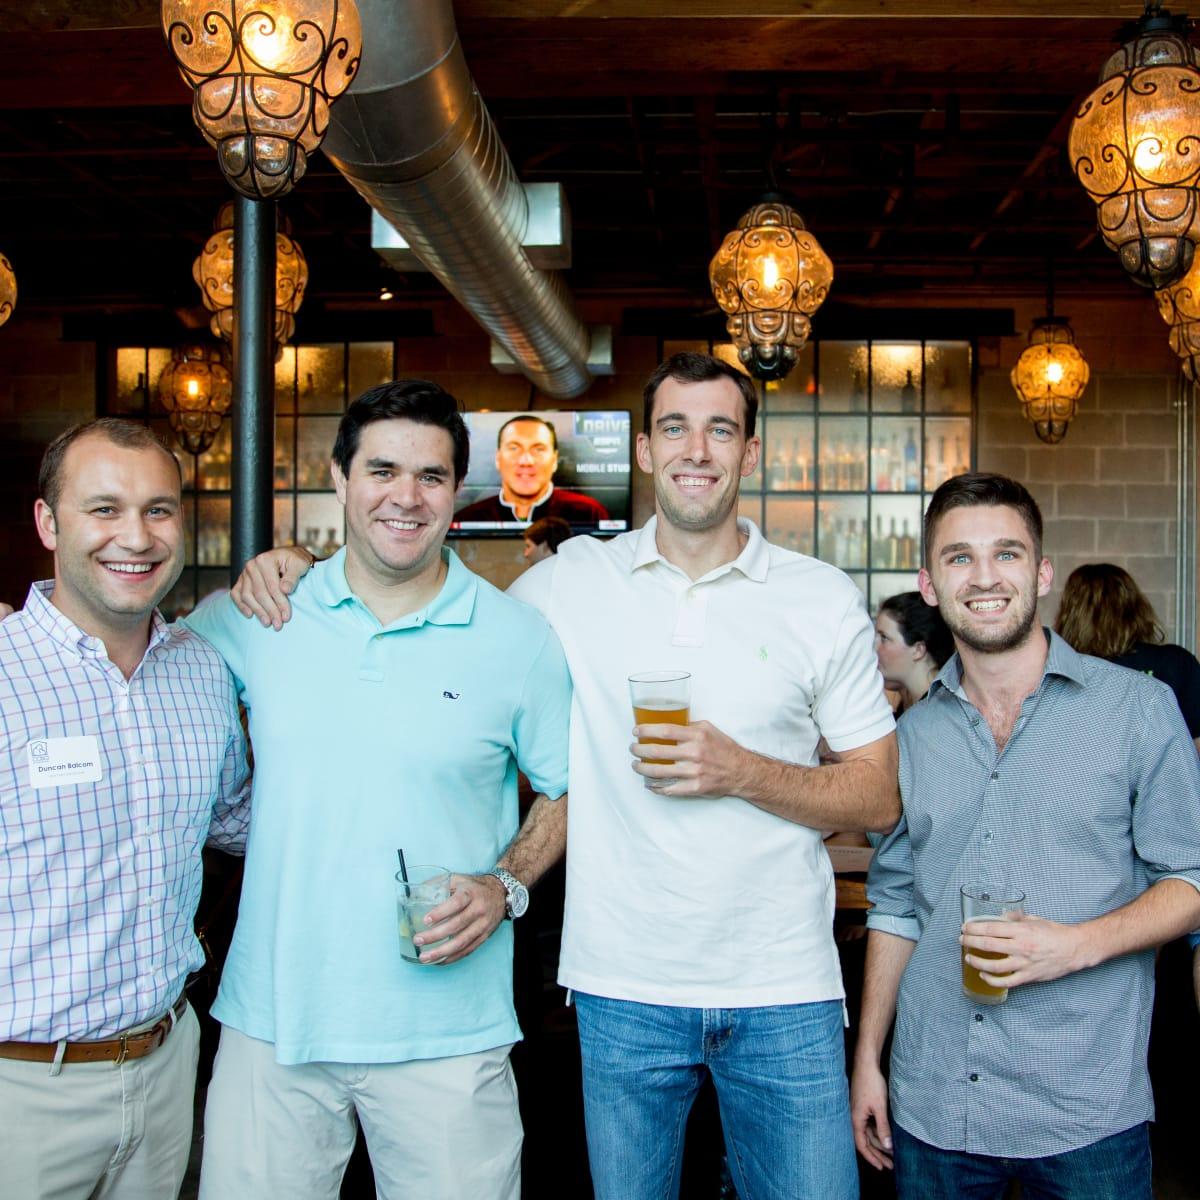 Houston, Casa de Esperanza YP Happy Hour, September 2015, Duncan Balcom, Mike Delaney, Todd Fineman, Patrick Hawkey, Chris Kruse